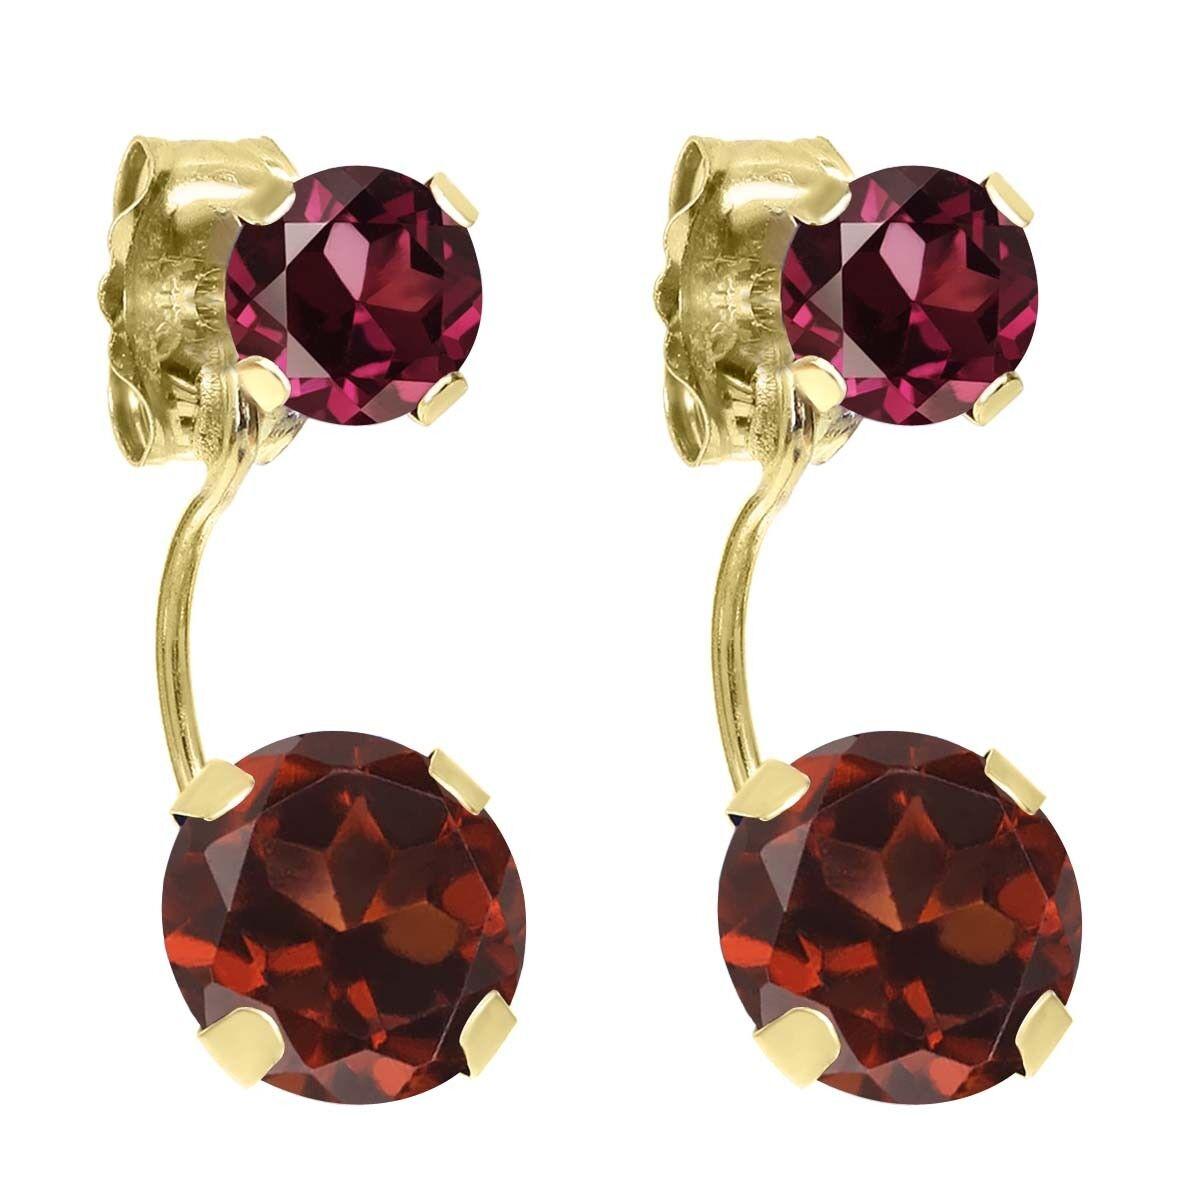 2.74 Ct Round Red Garnet Red Rhodolite Garnet 14K Yellow gold Earrings